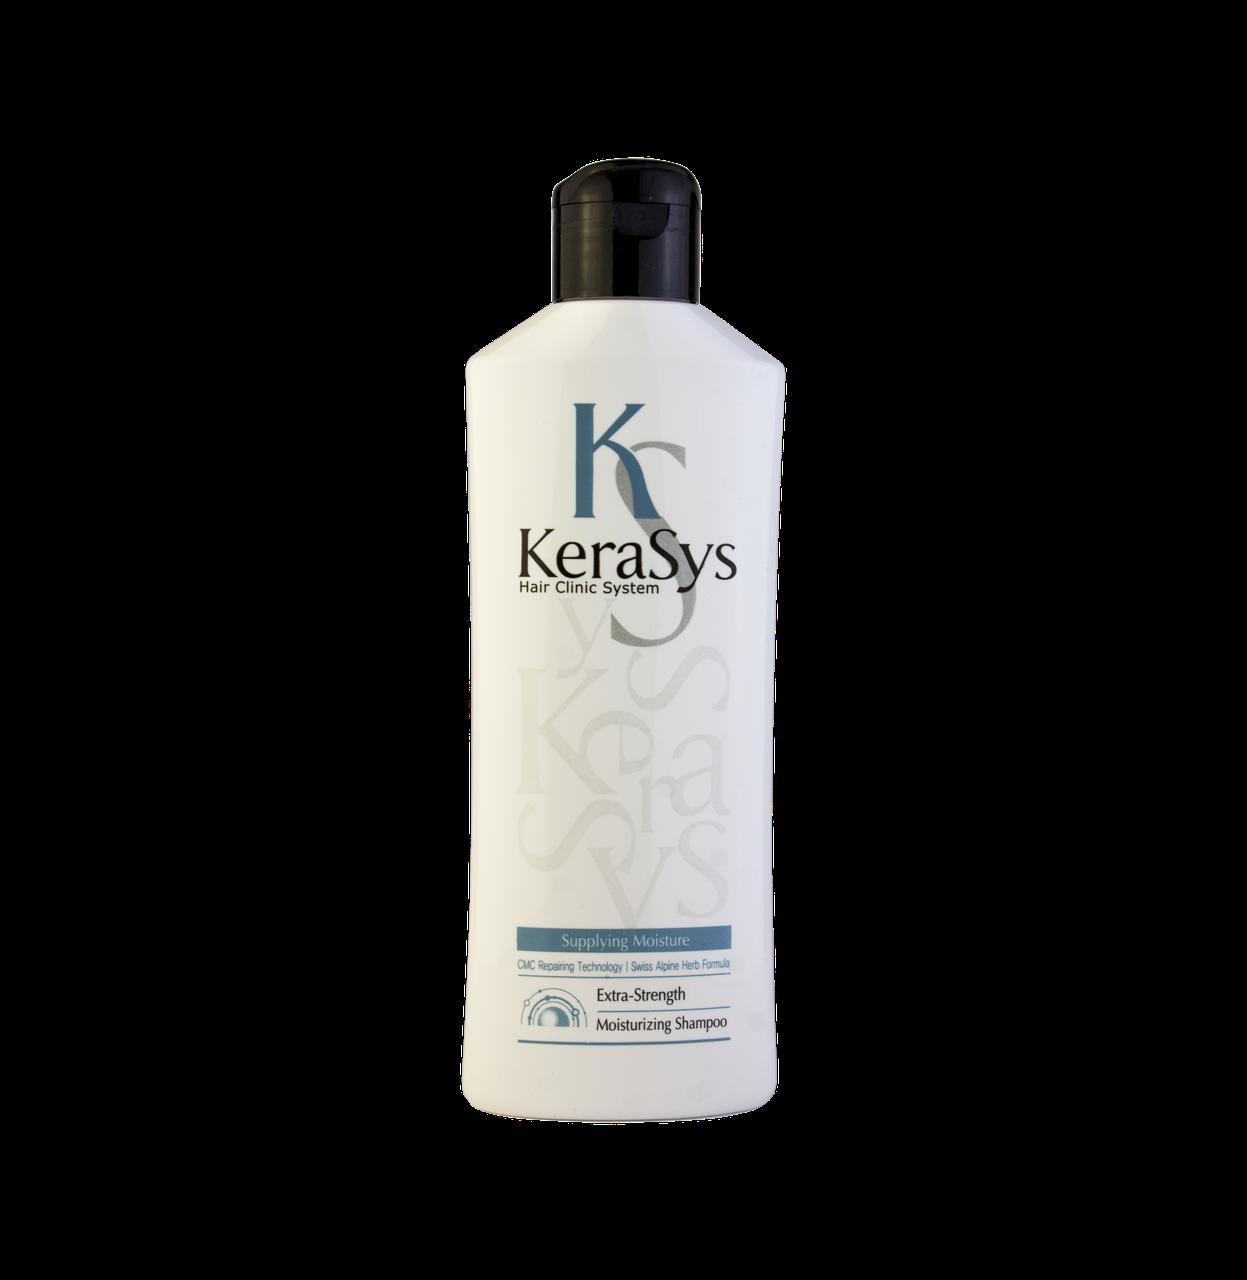 KeraSys Hair Clinic Moisturising Shampoo Шампунь для волос увлажняющий 180 мл.